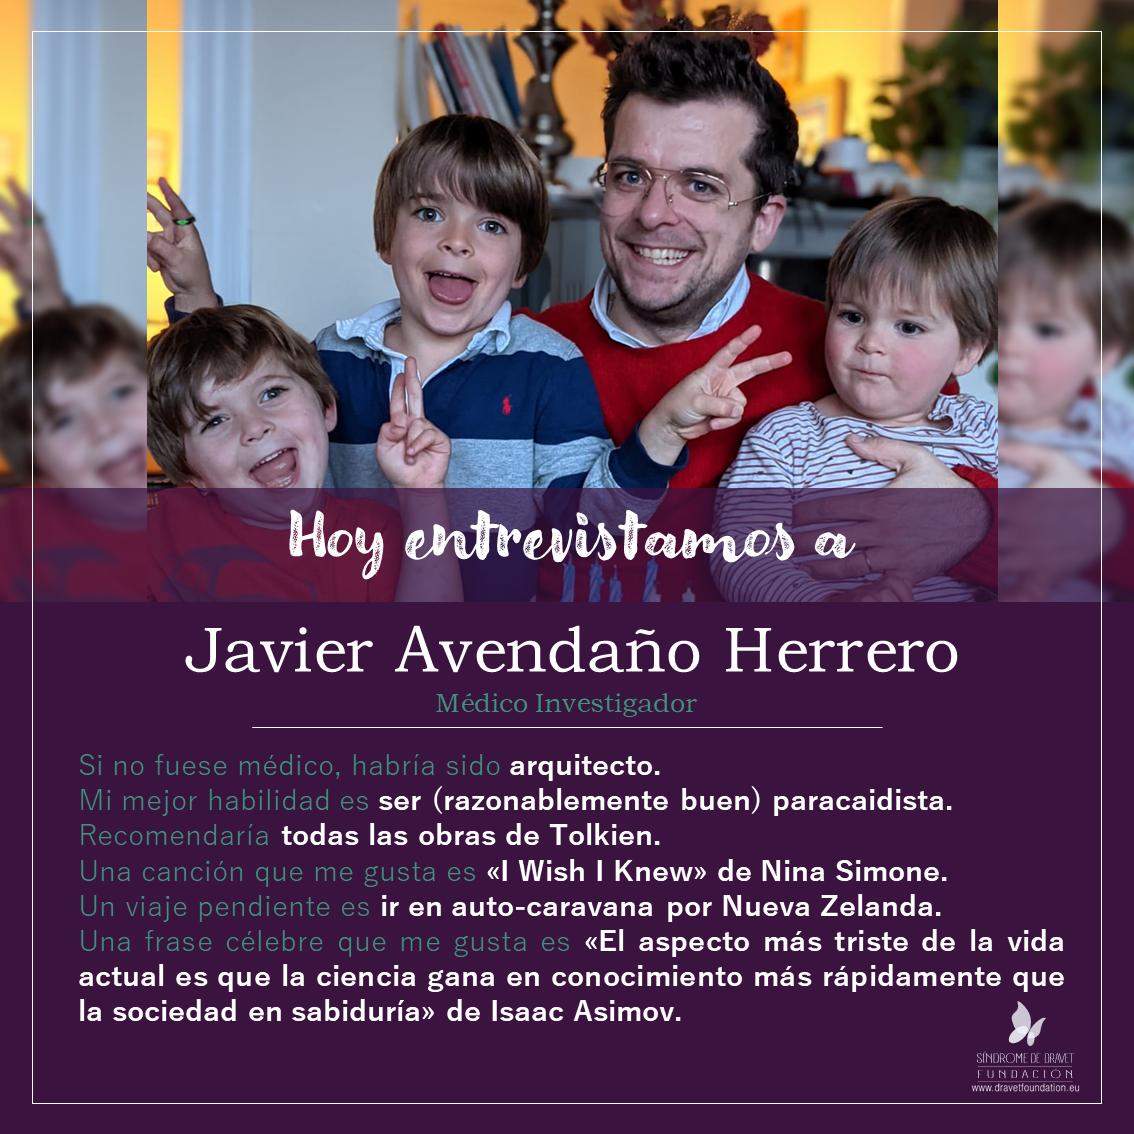 Entrevistamos a Javier Avendaño